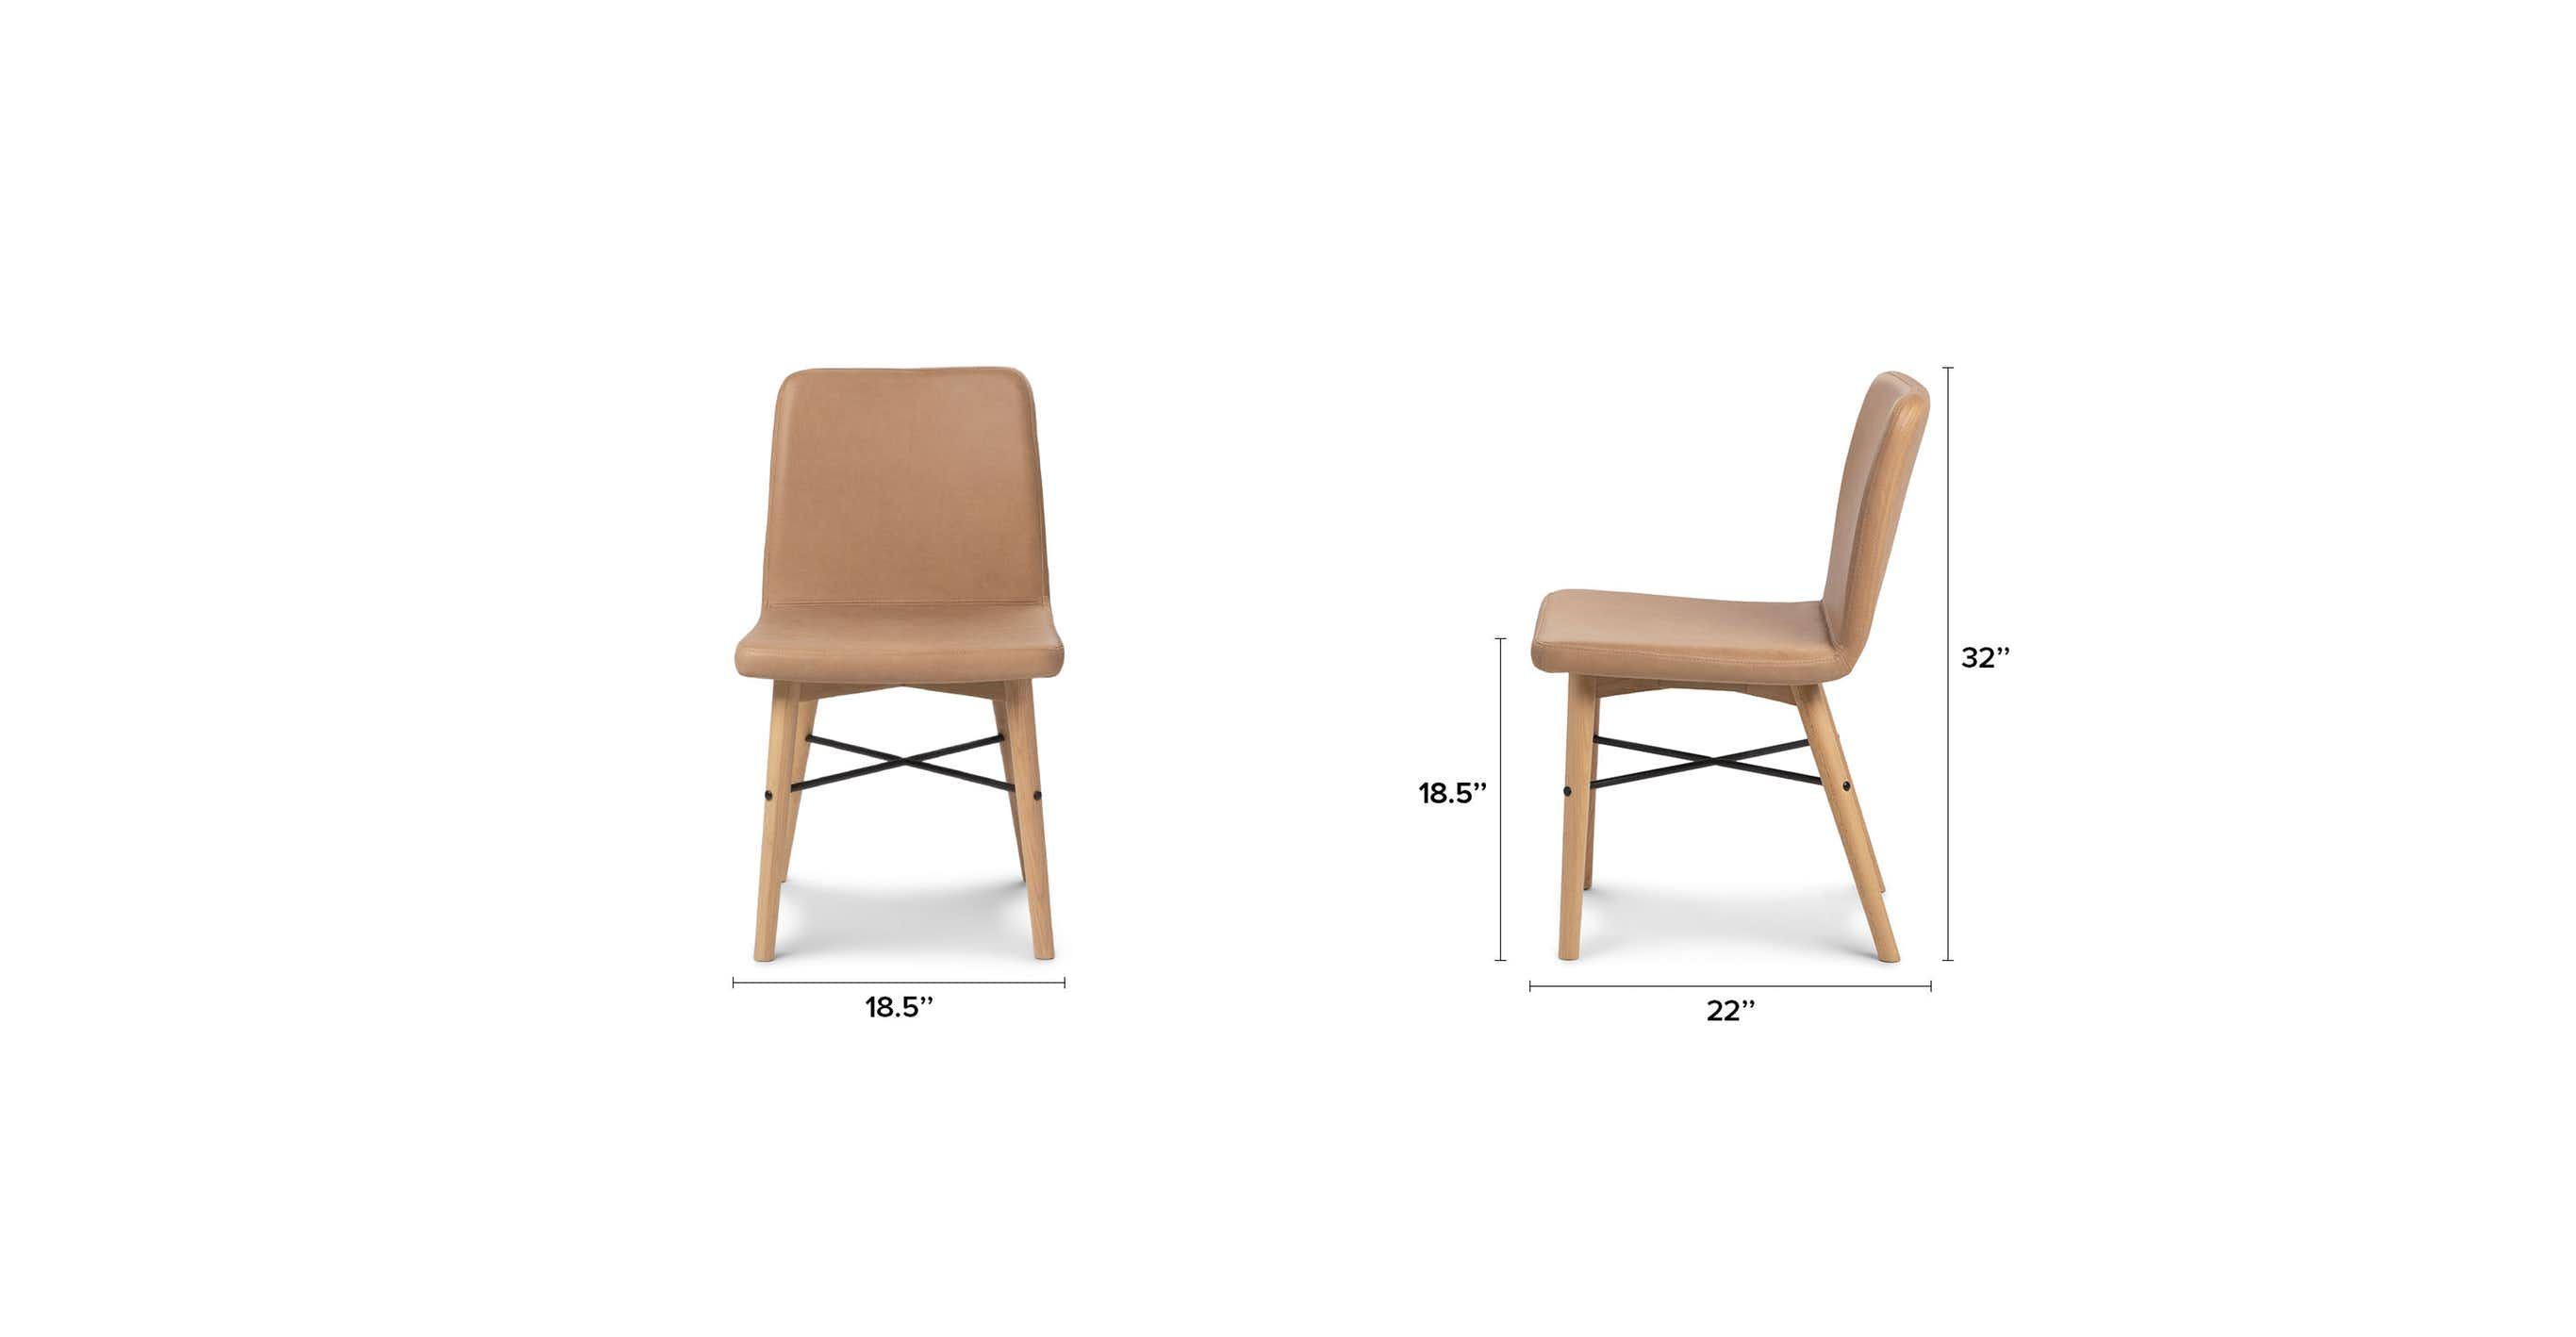 Kissa Canyon Tan Light Oak Dining Chair Oak Dining Chairs Dining Chairs Light Oak